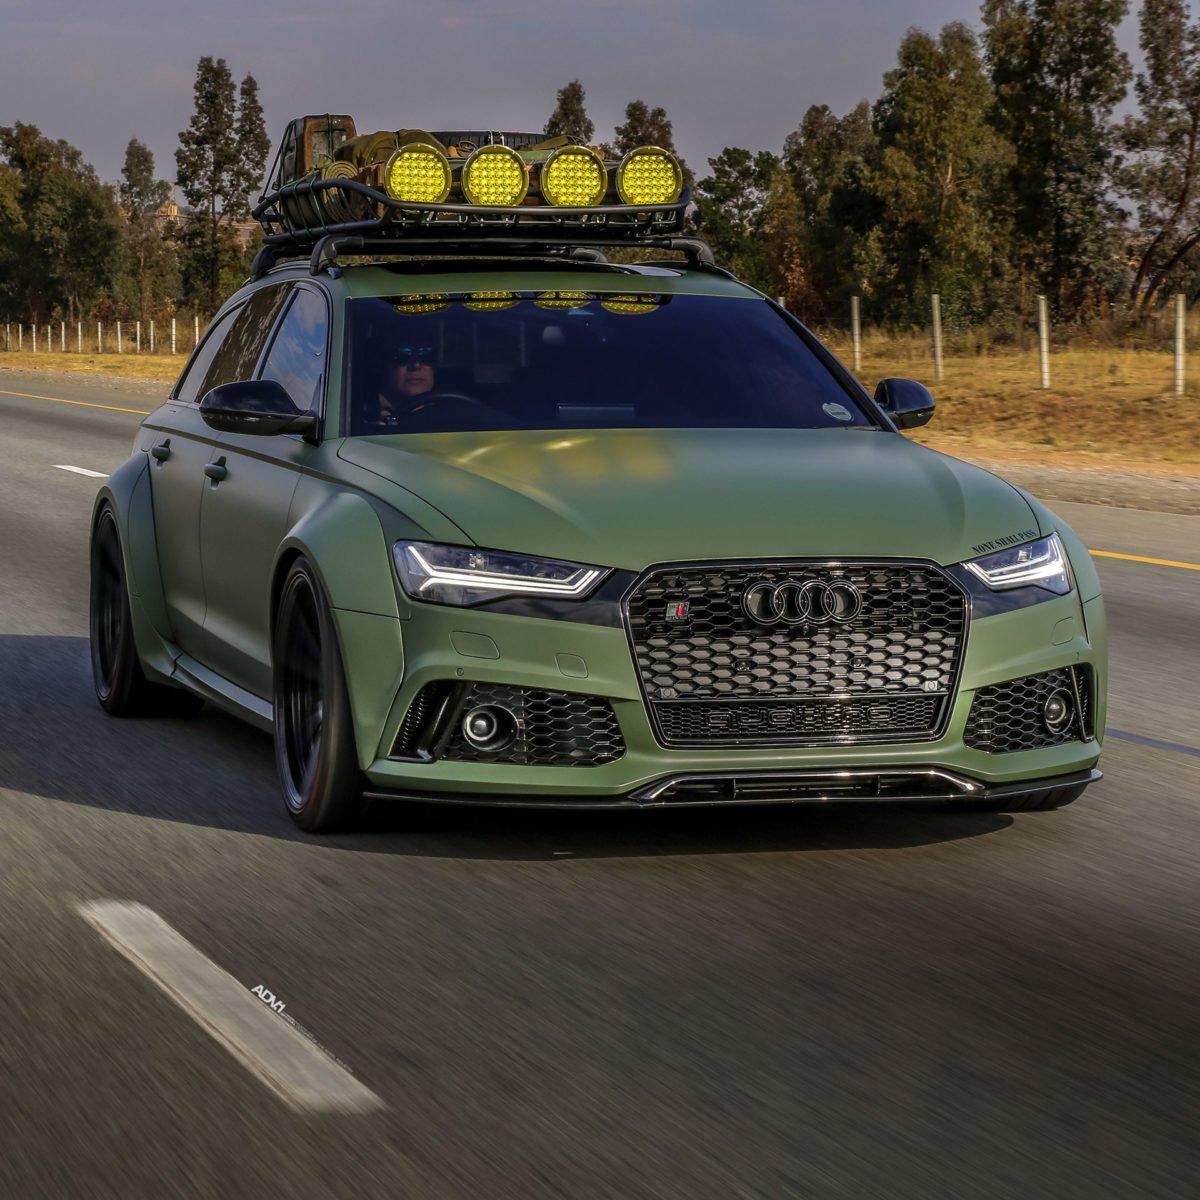 Audi RS6 in Army Green - Audi RS6 in Army Green